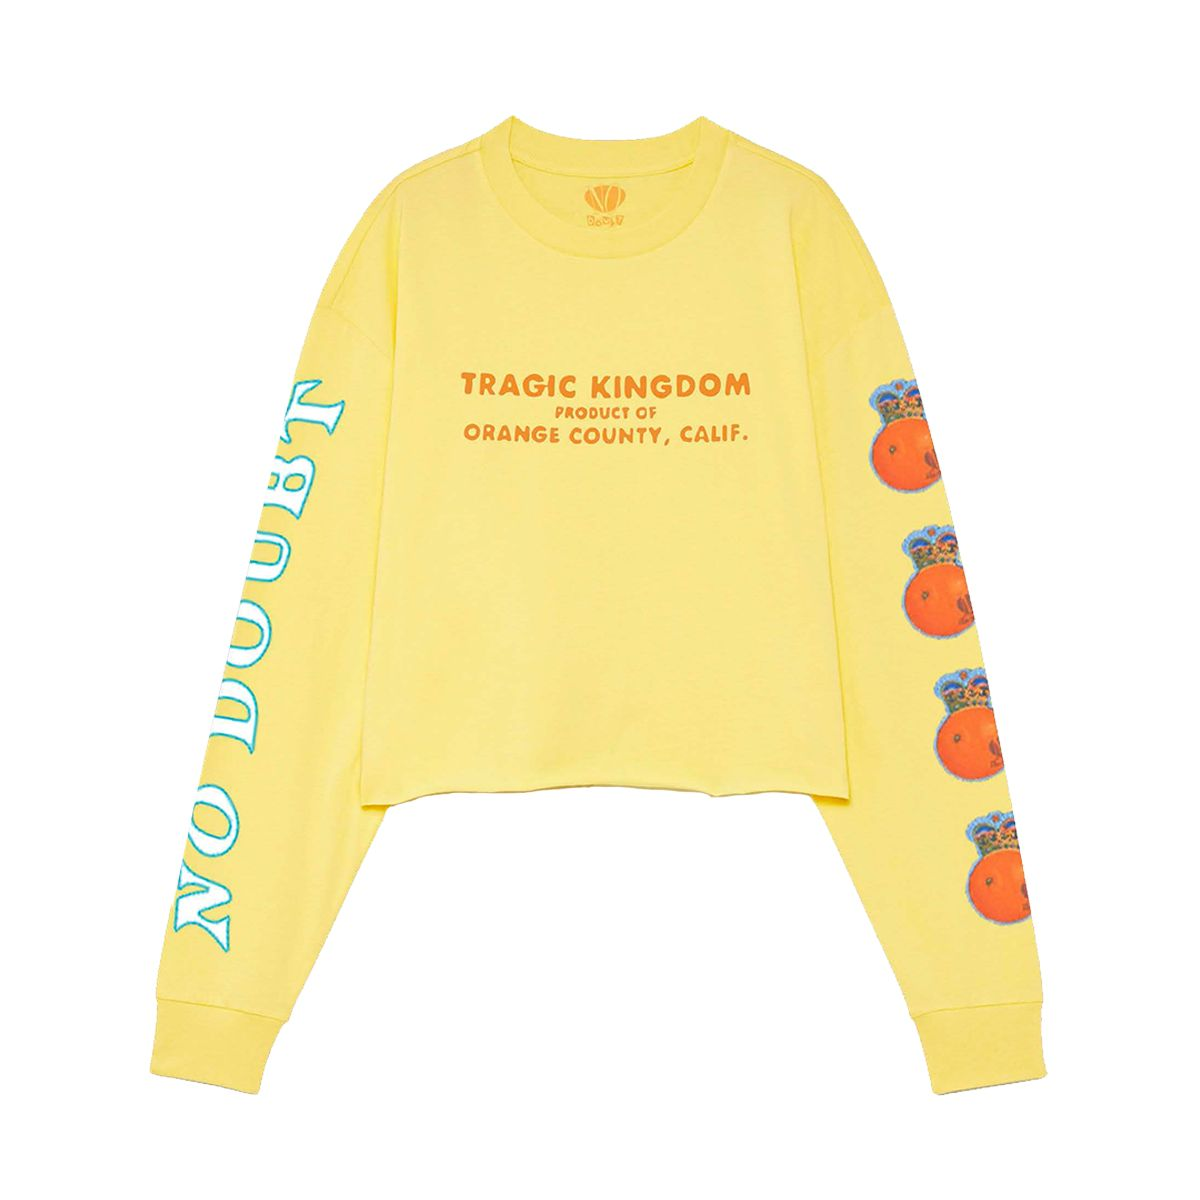 Tragic Kingdom Yellow Crop